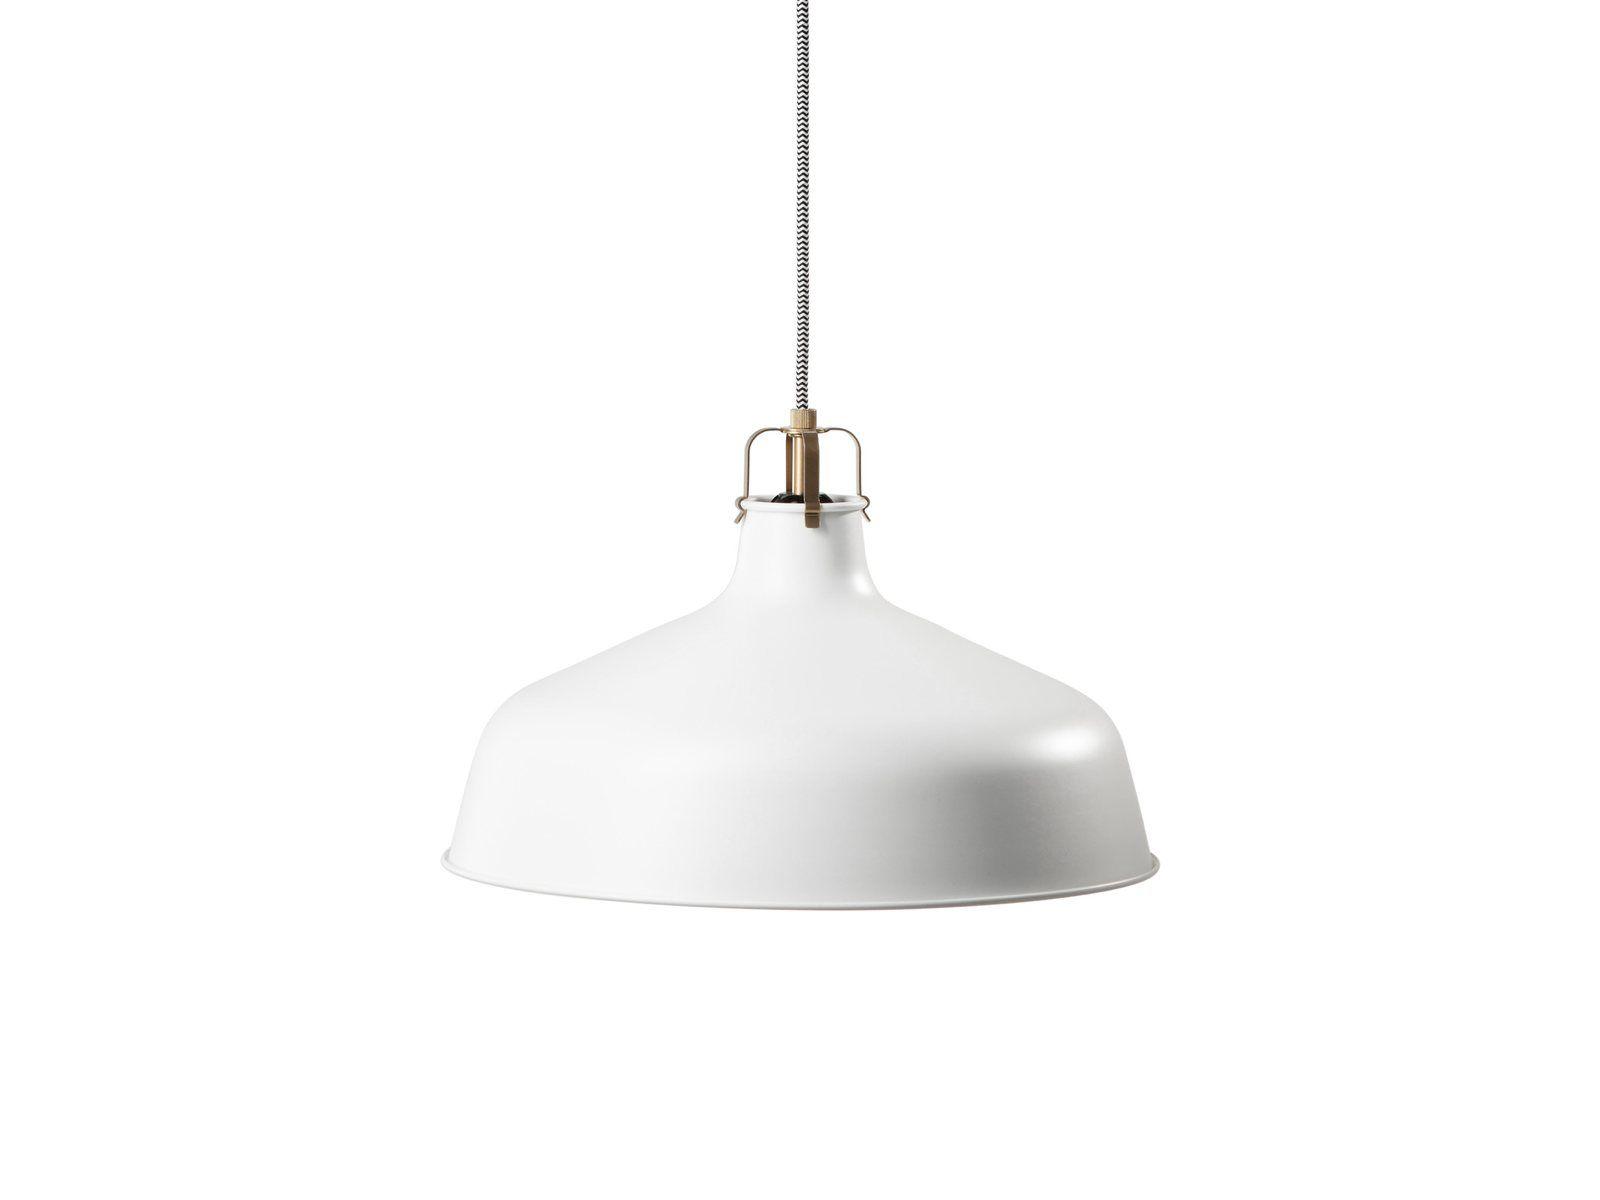 Lampen Ikea Hang : Ikea melodi pendant lamp lighting hanging home decor stylish new